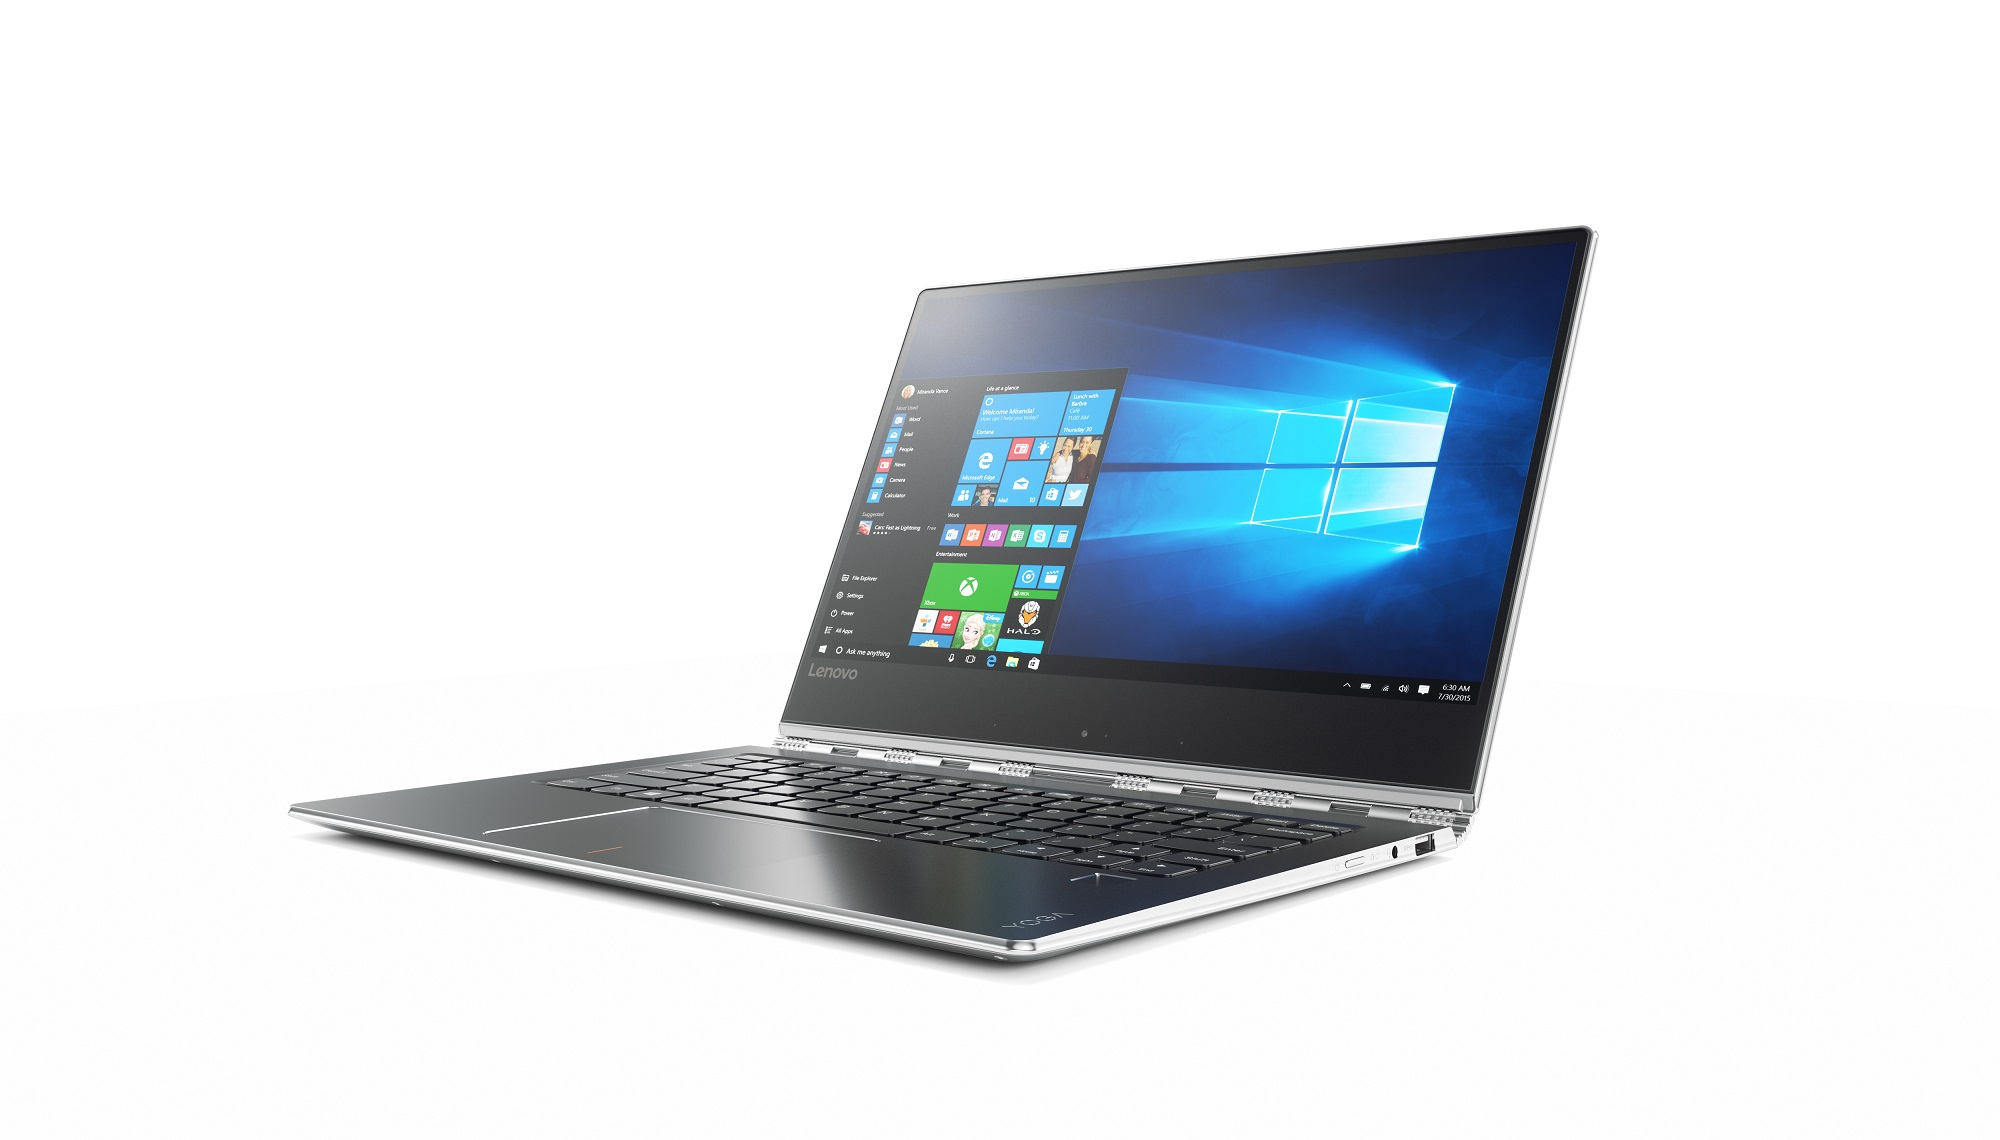 Lenovo Yoga 910 13.9 UHD IPS MULTI-TOUCH/I7-7500U/1TB SSD/16G/INT/W10 PRO stříbrný